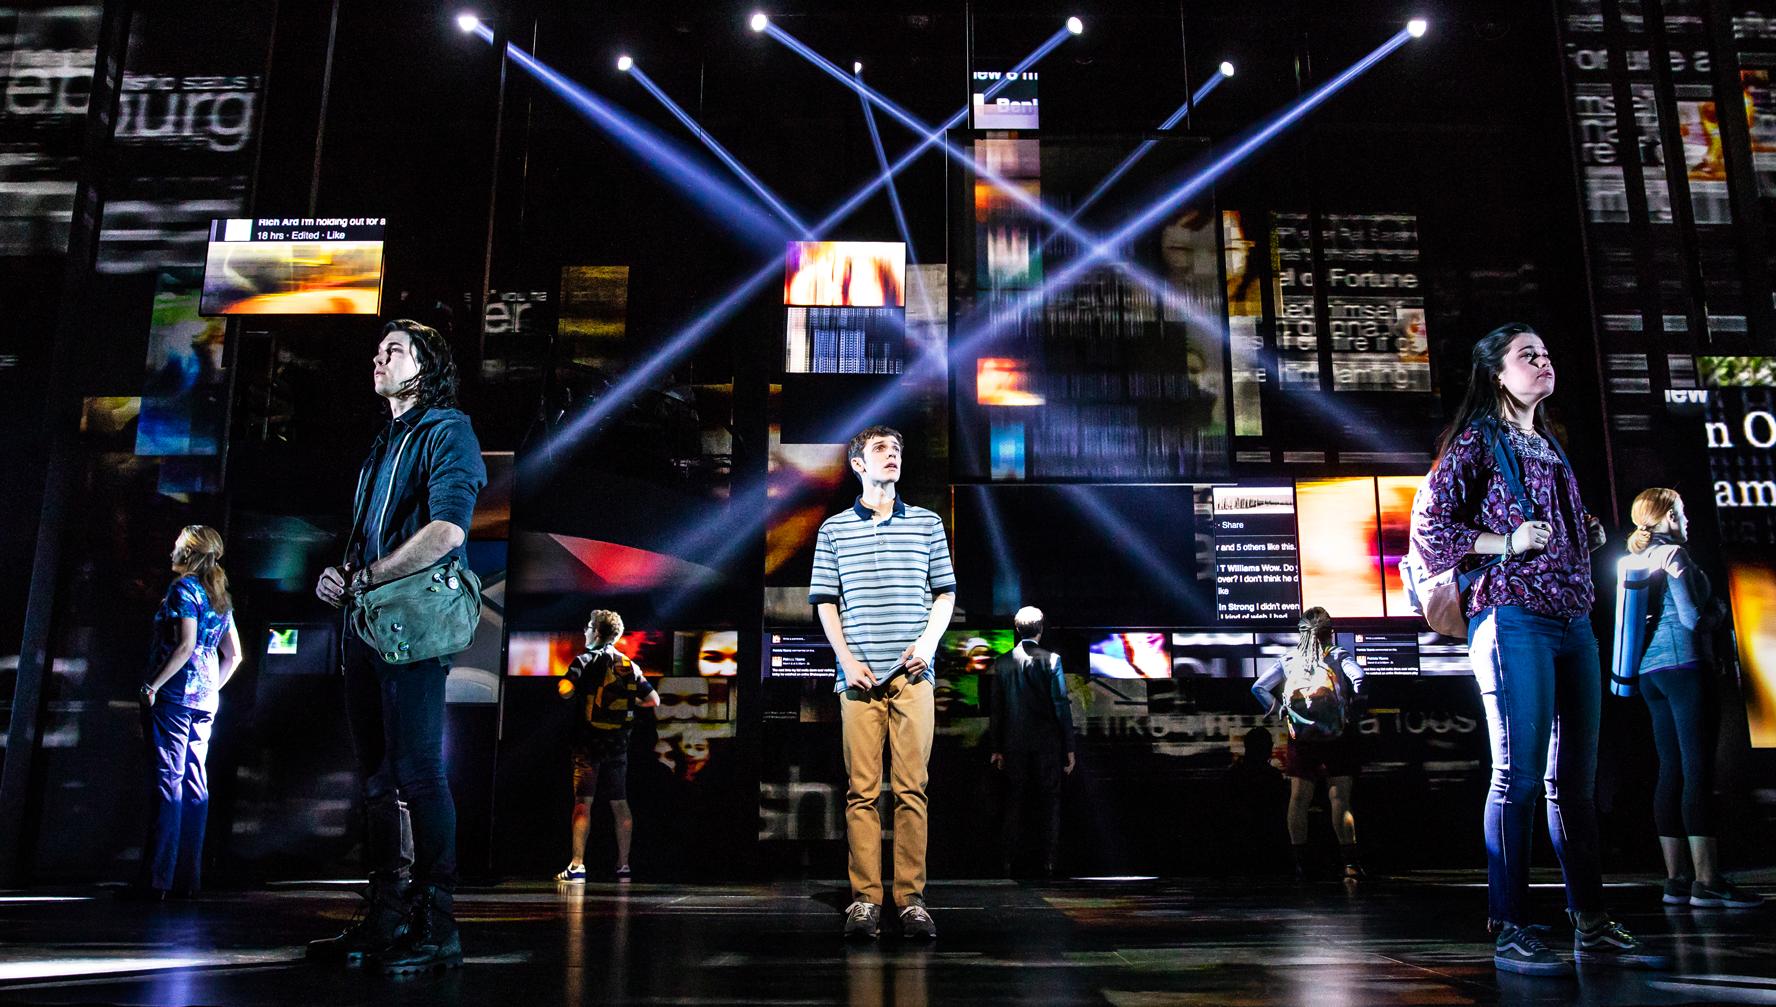 Broadway Schedule 2020 Hamilton,' 'Dear Evan Hansen' and more for TPAC's 2019 2020